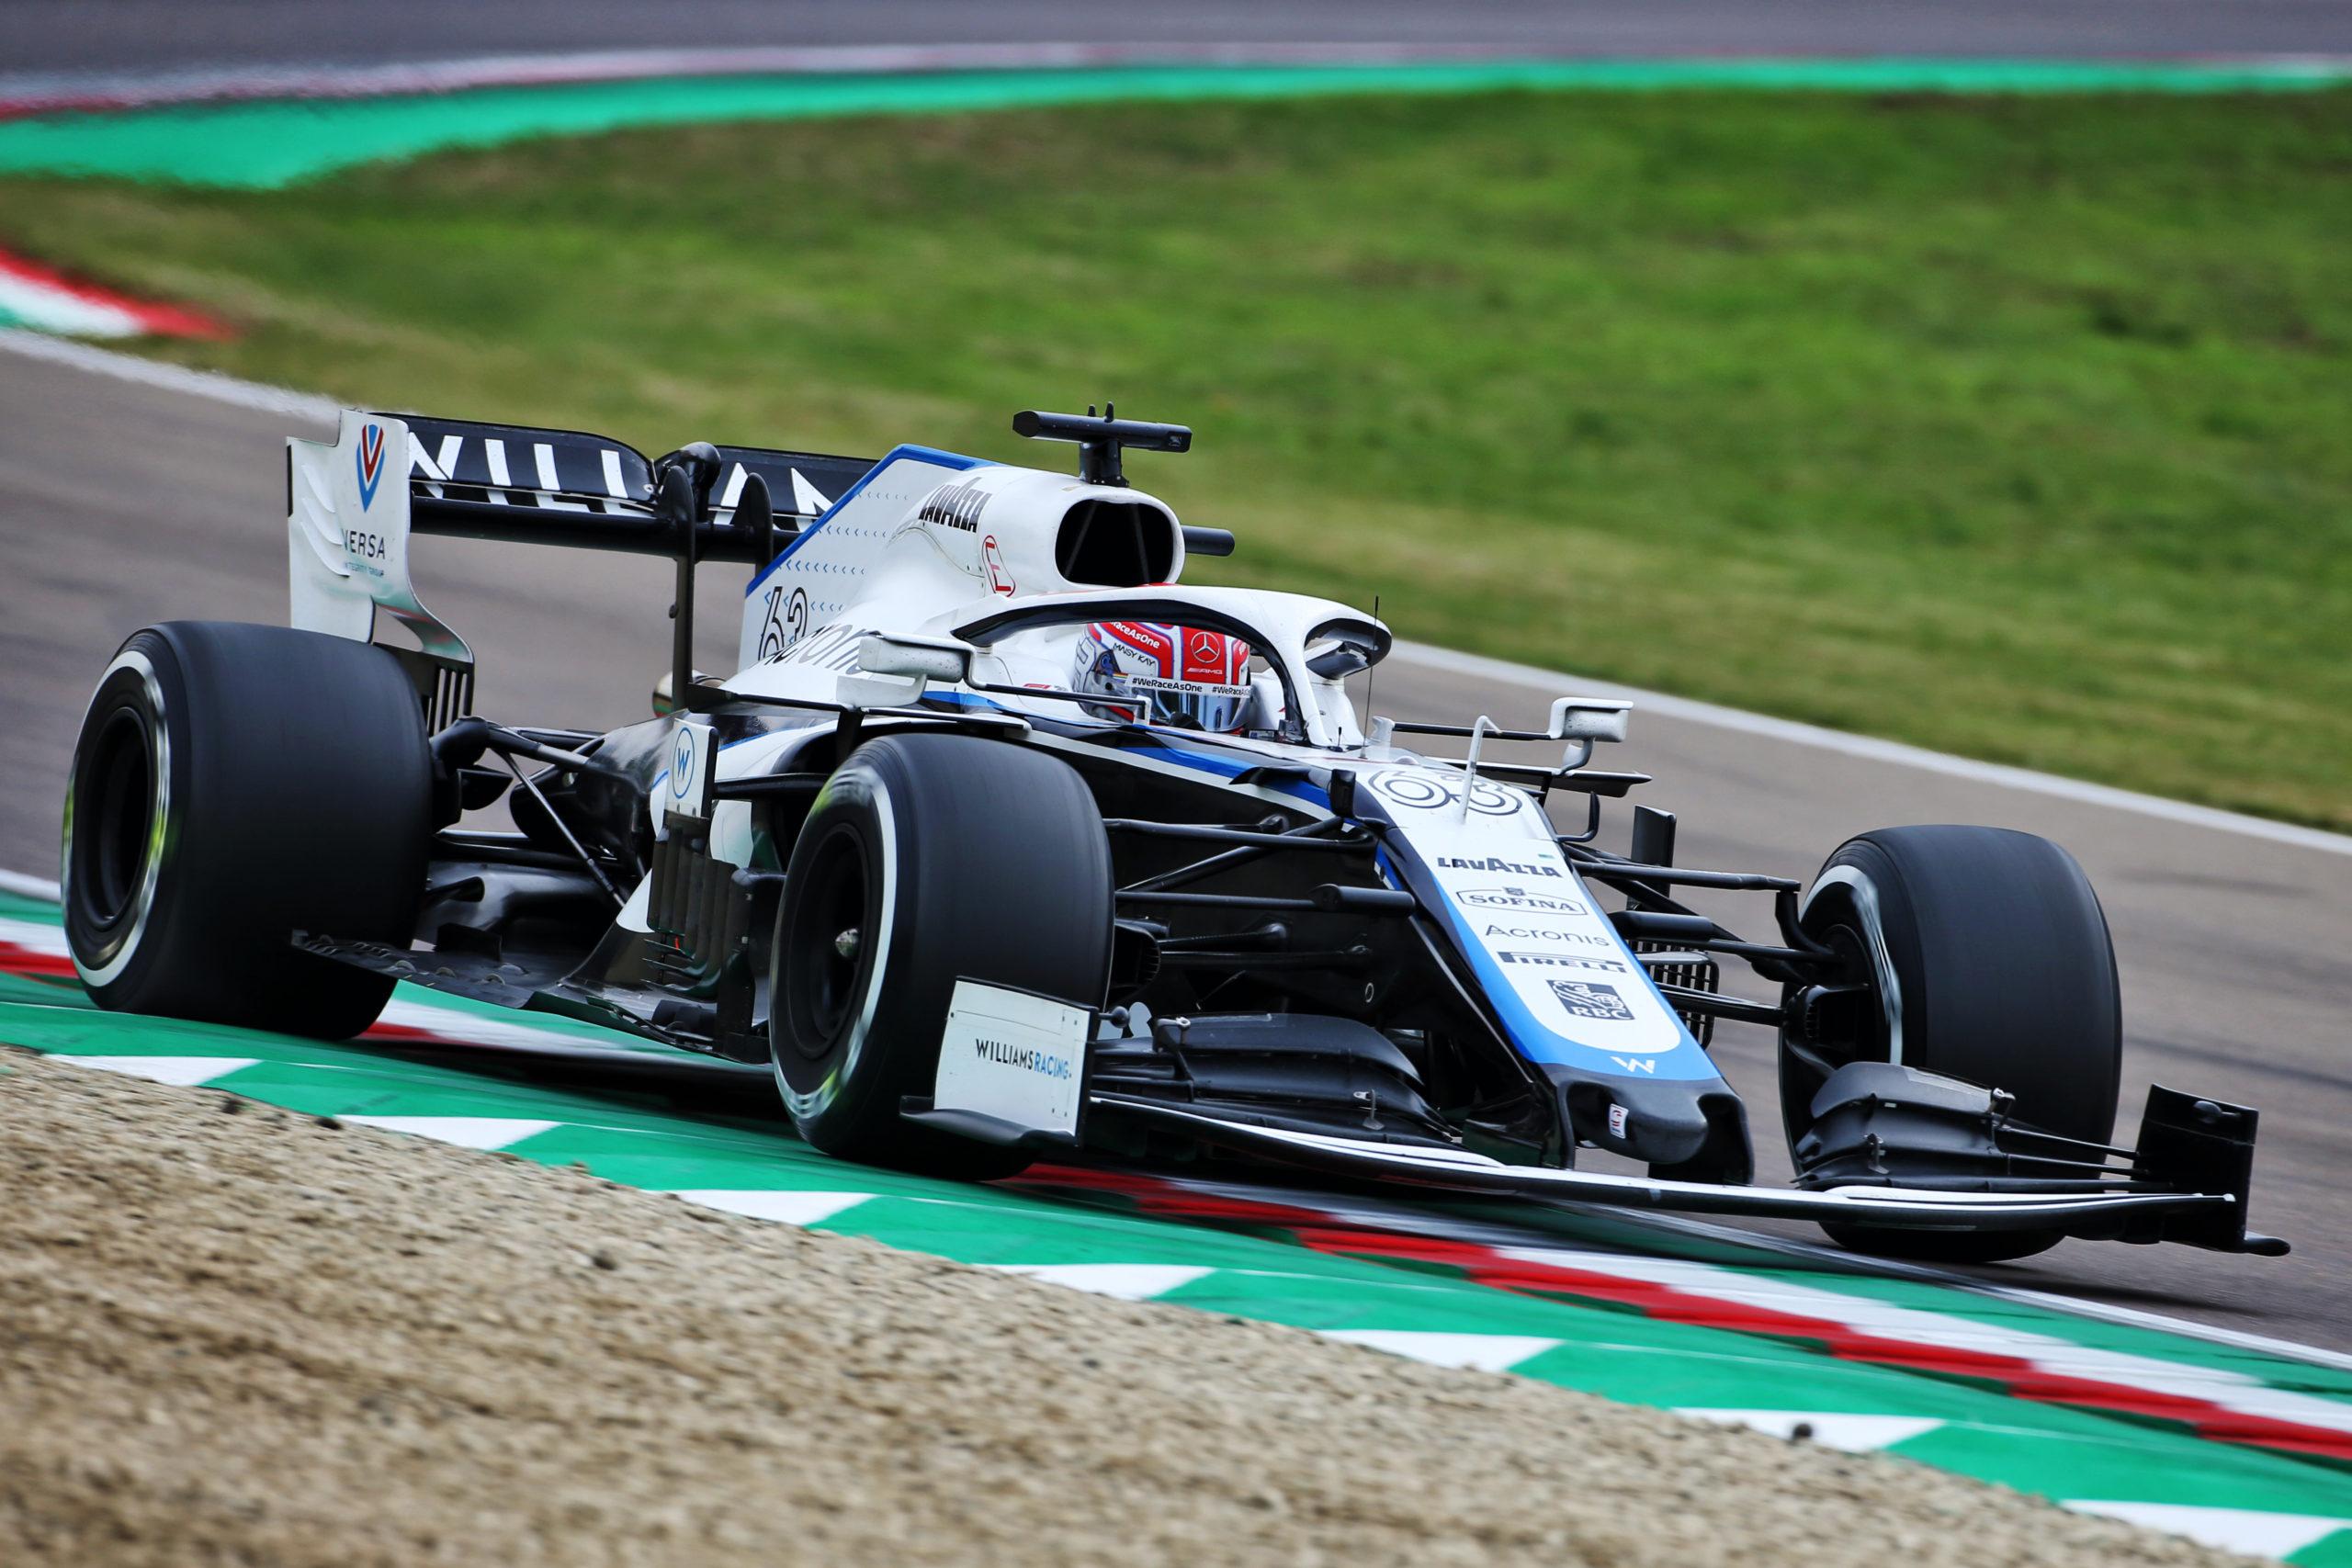 George Russell (GBR) Williams Racing FW43. Emilia Romagna Grand Prix, Sunday 1st November 2020. Imola, Italy.